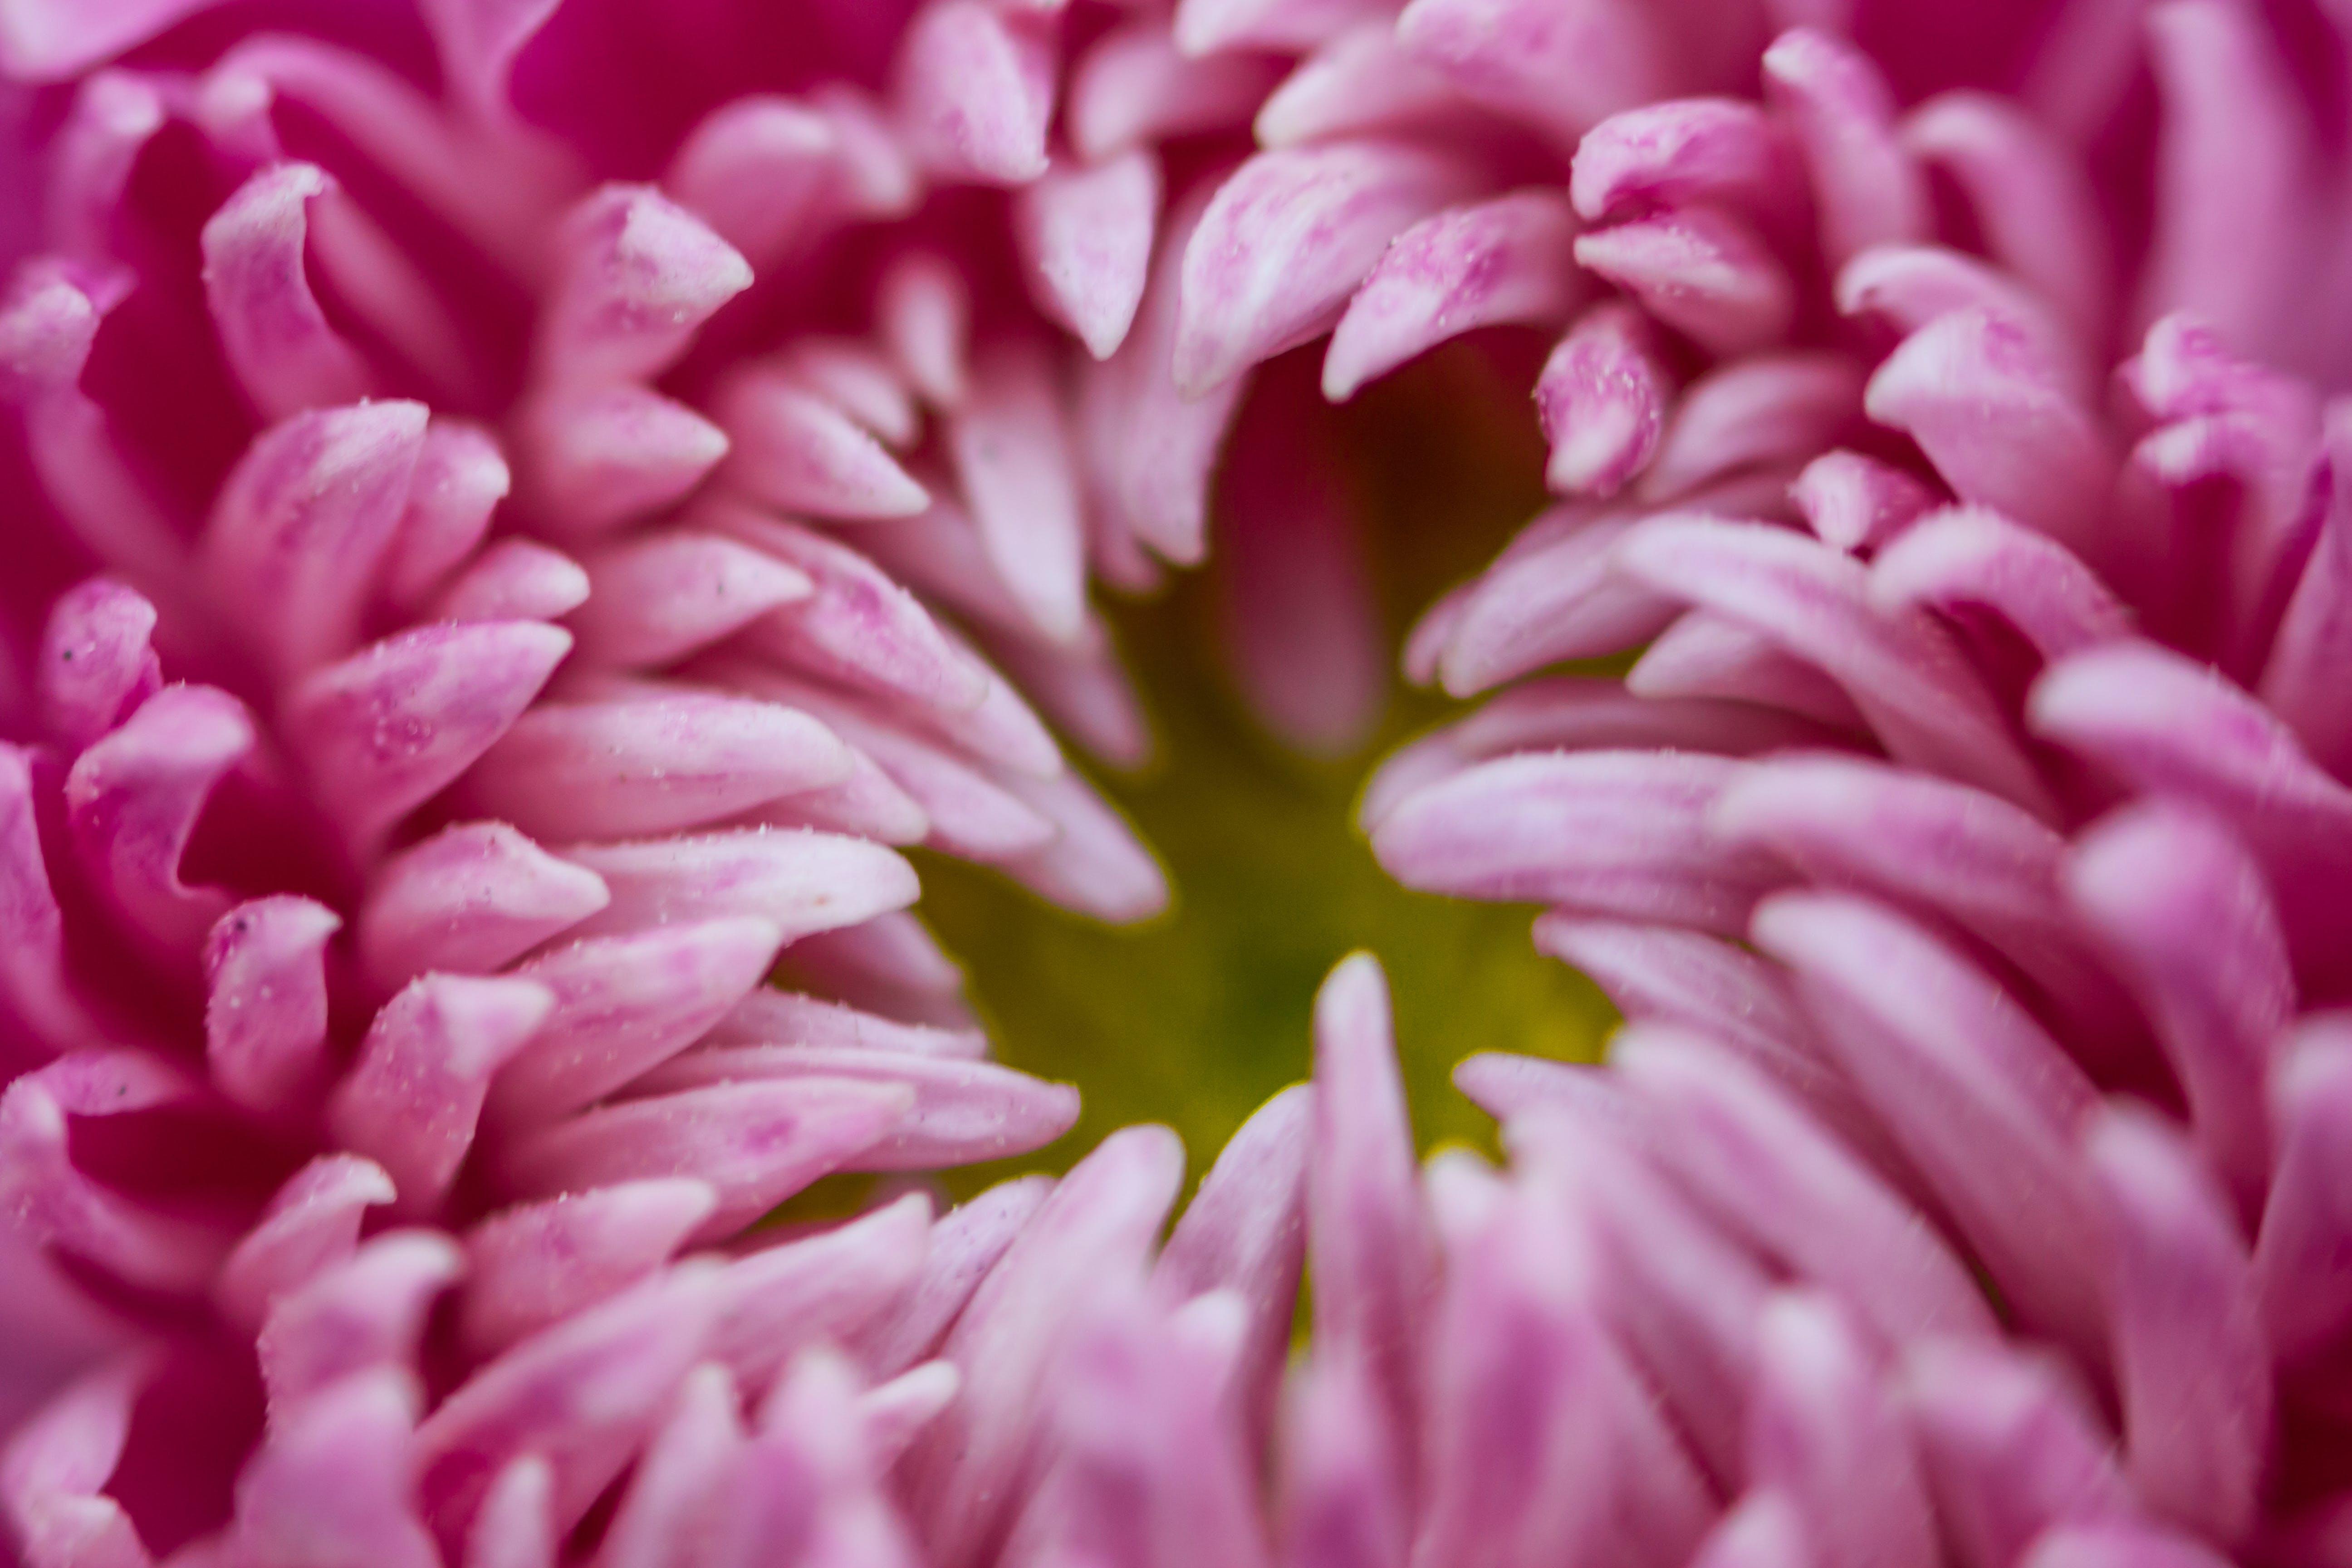 Macro Photography of Flower Petals